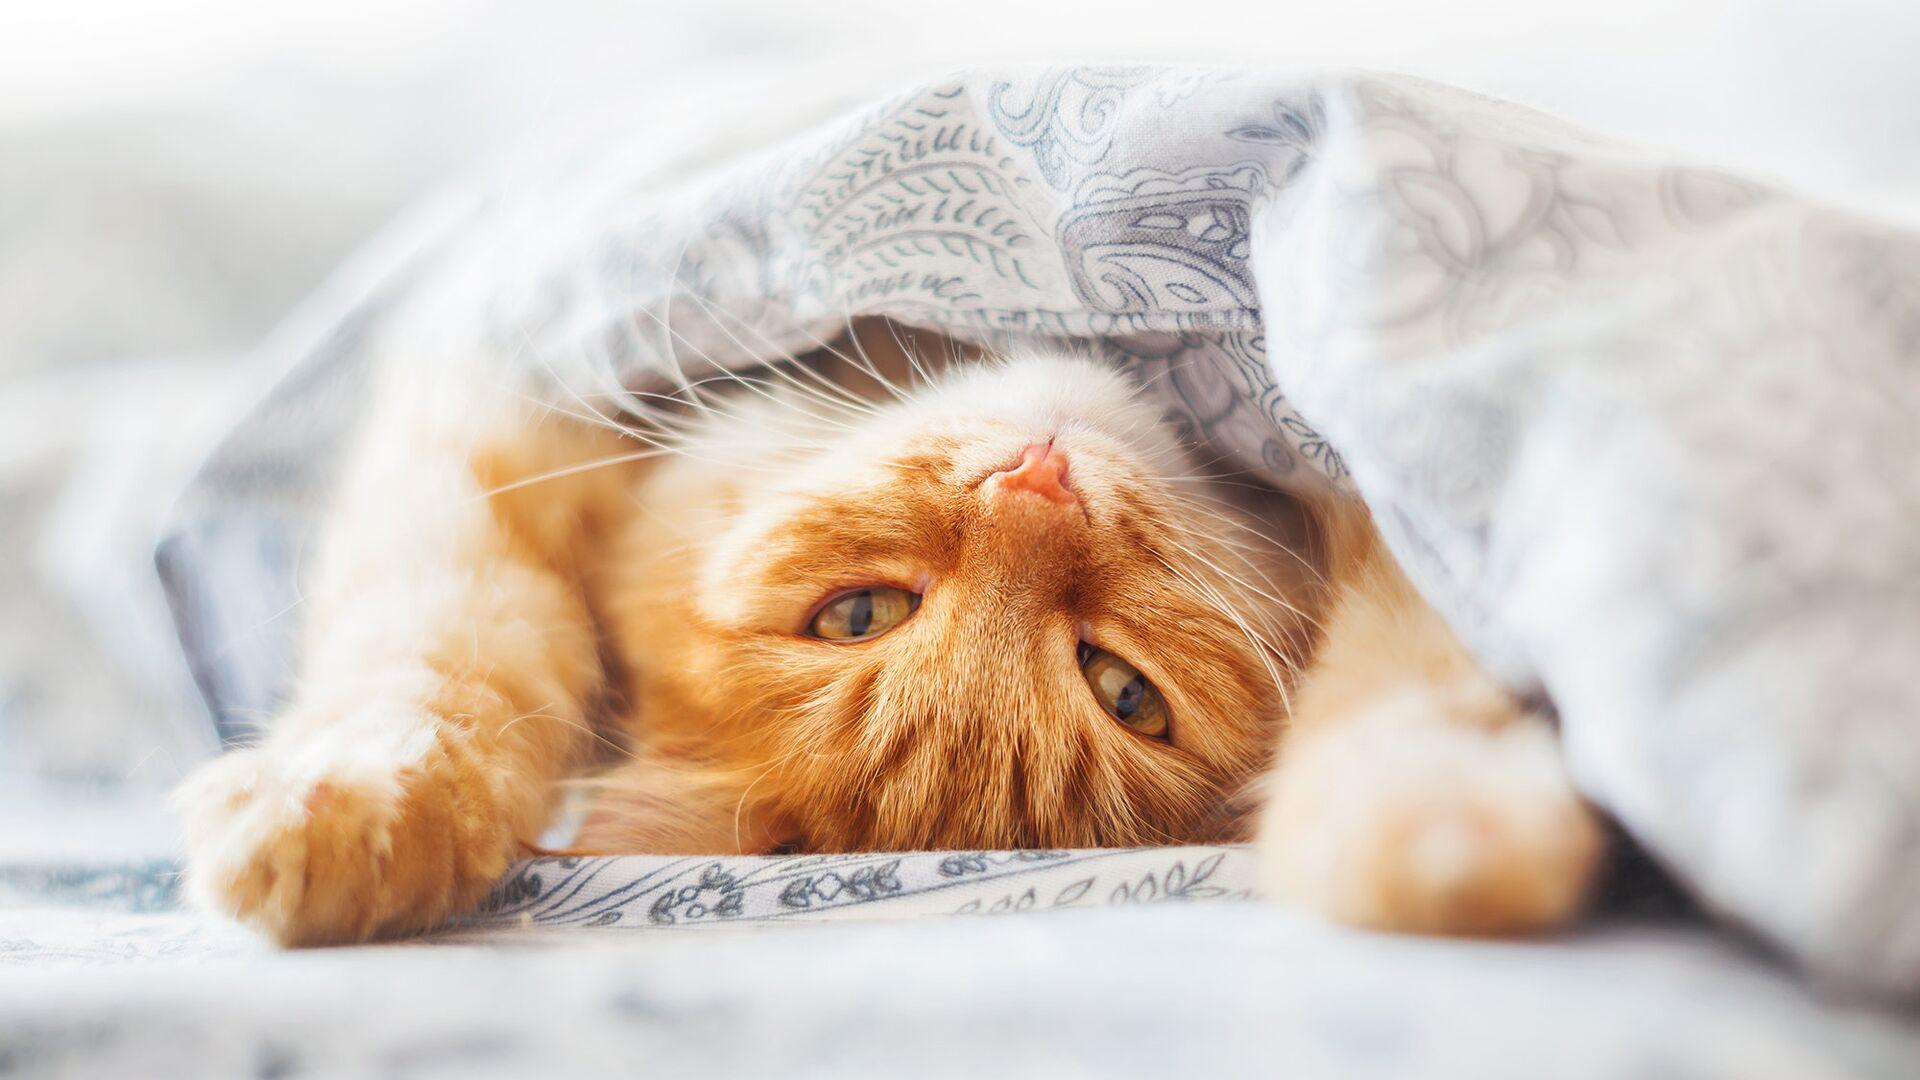 Кот под одеялом - РИА Новости, 1920, 08.04.2021